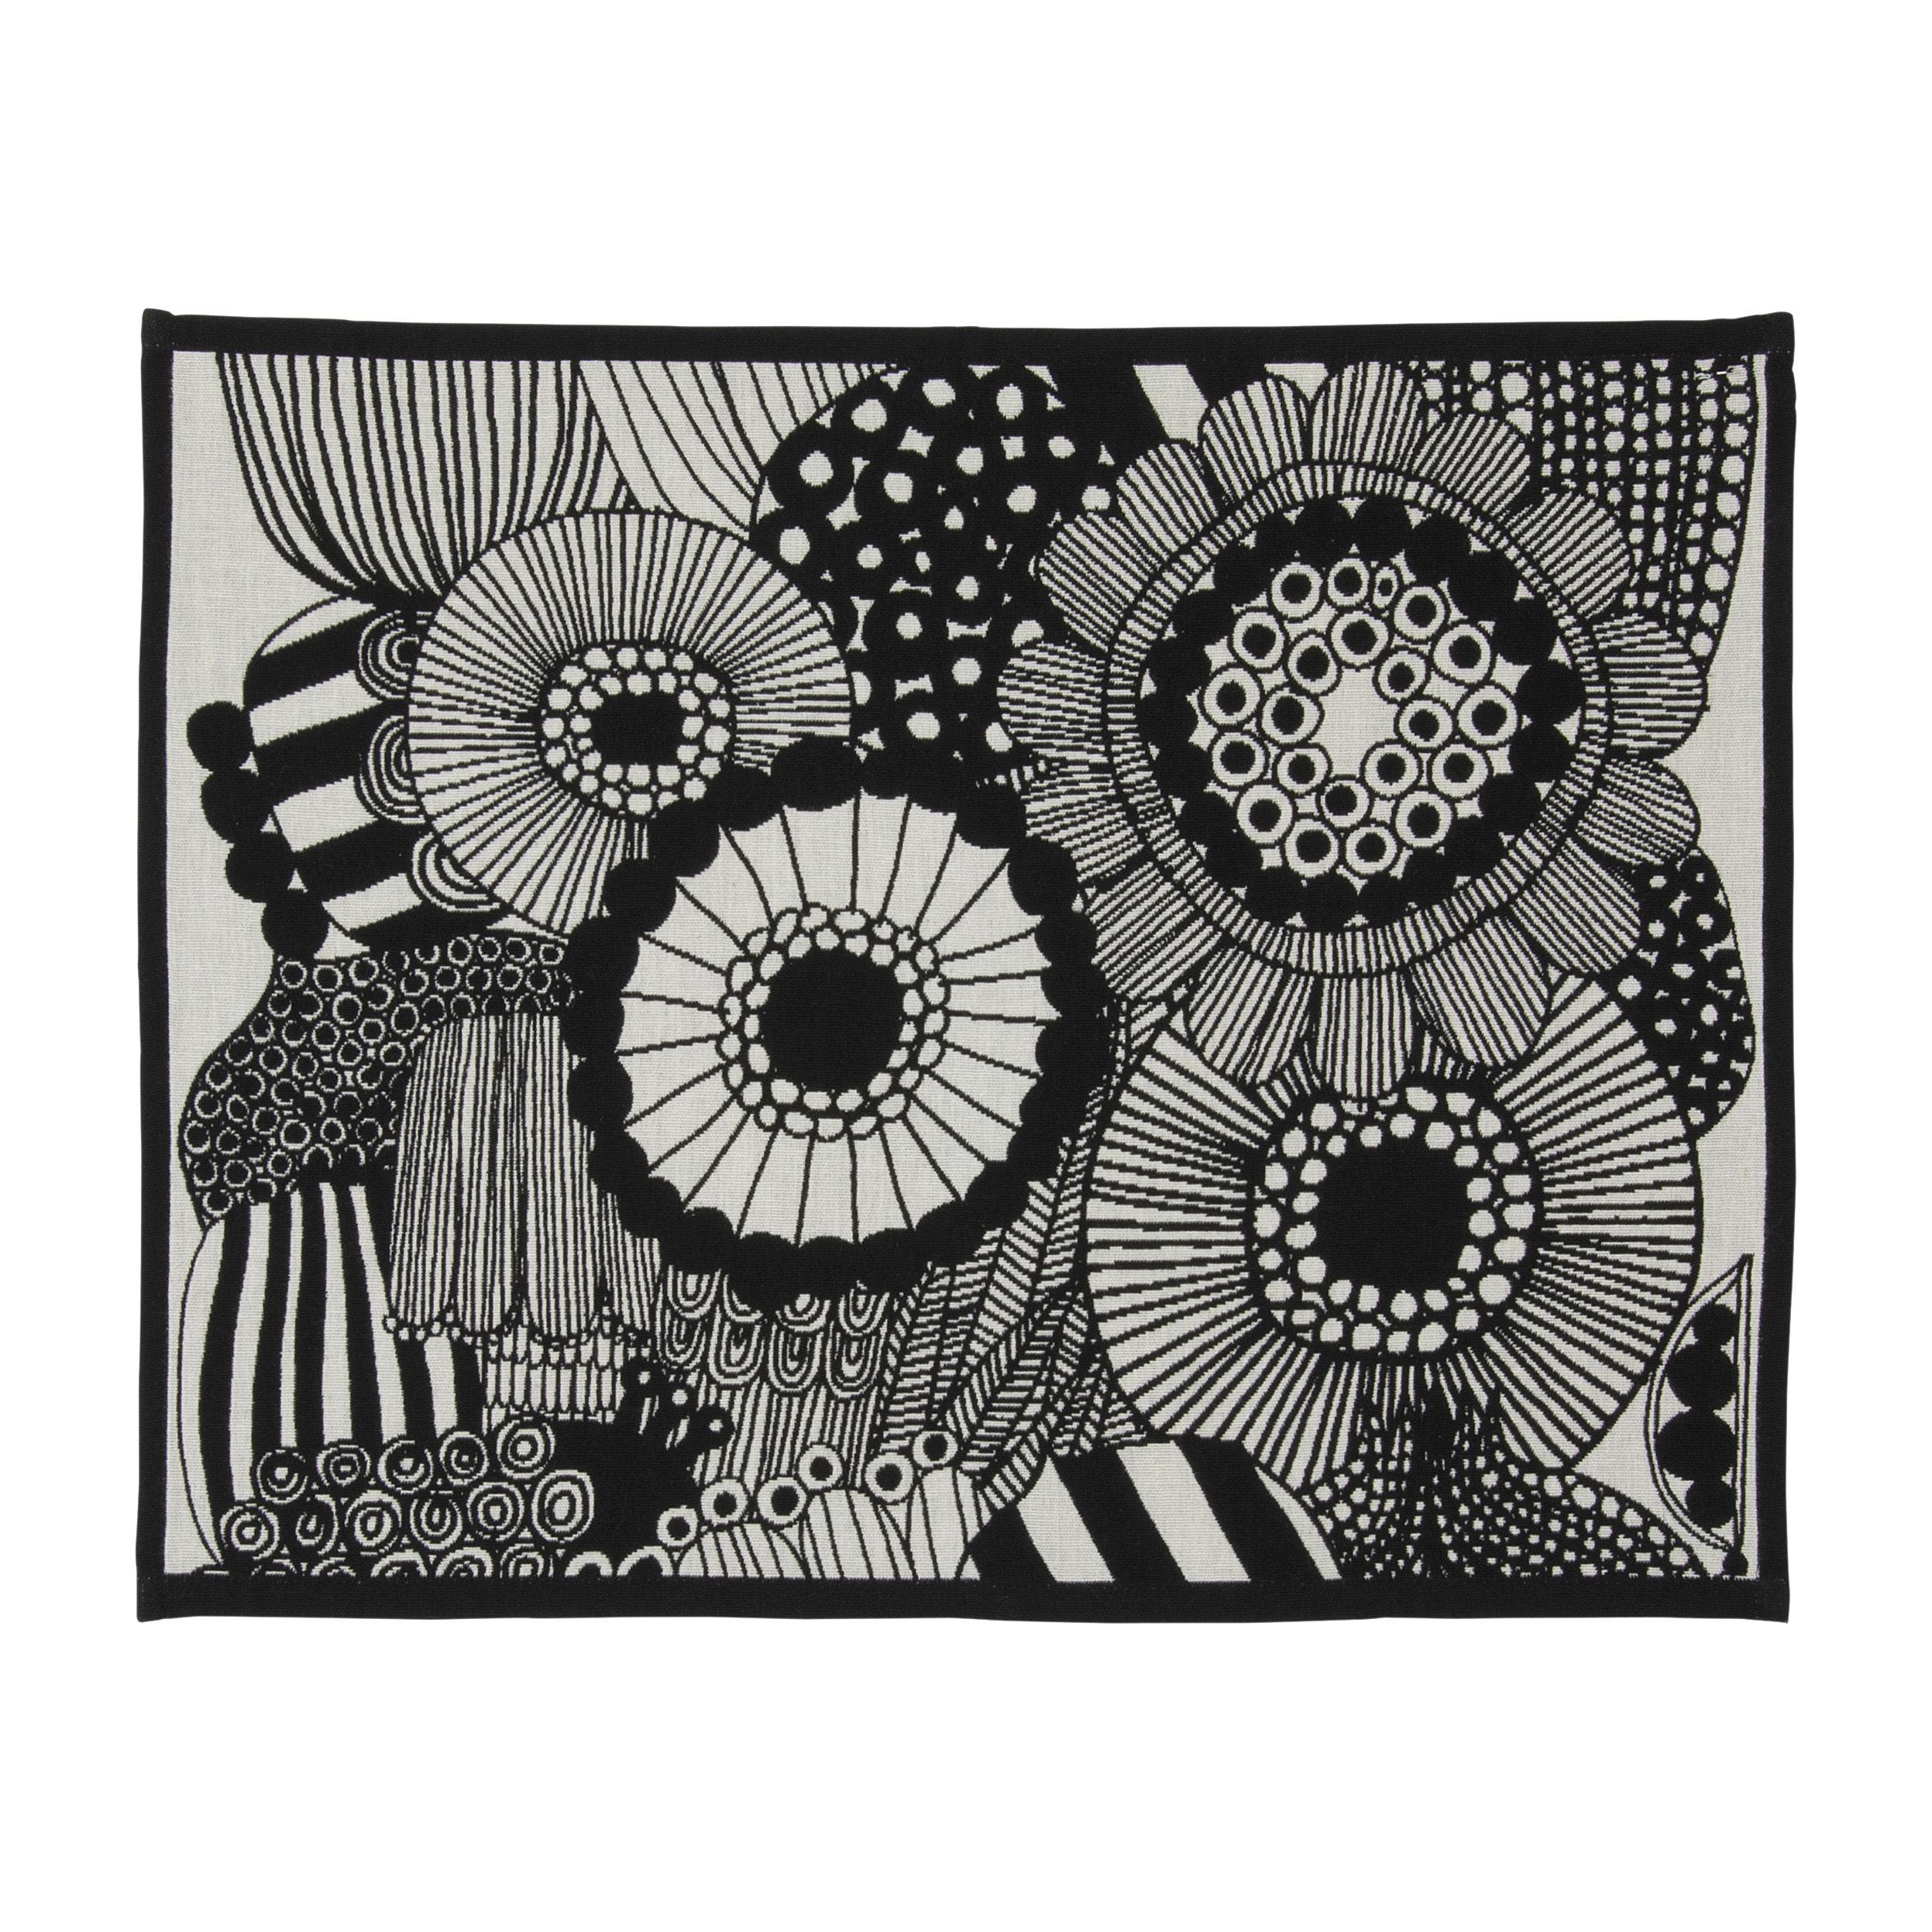 Tableware - Napkins & Tablecloths - Pieni Siirtolapuutarha Placemat - / Cotton - 47 x 36 cm by Marimekko - Siirtolapuutarha / Black - Cotton